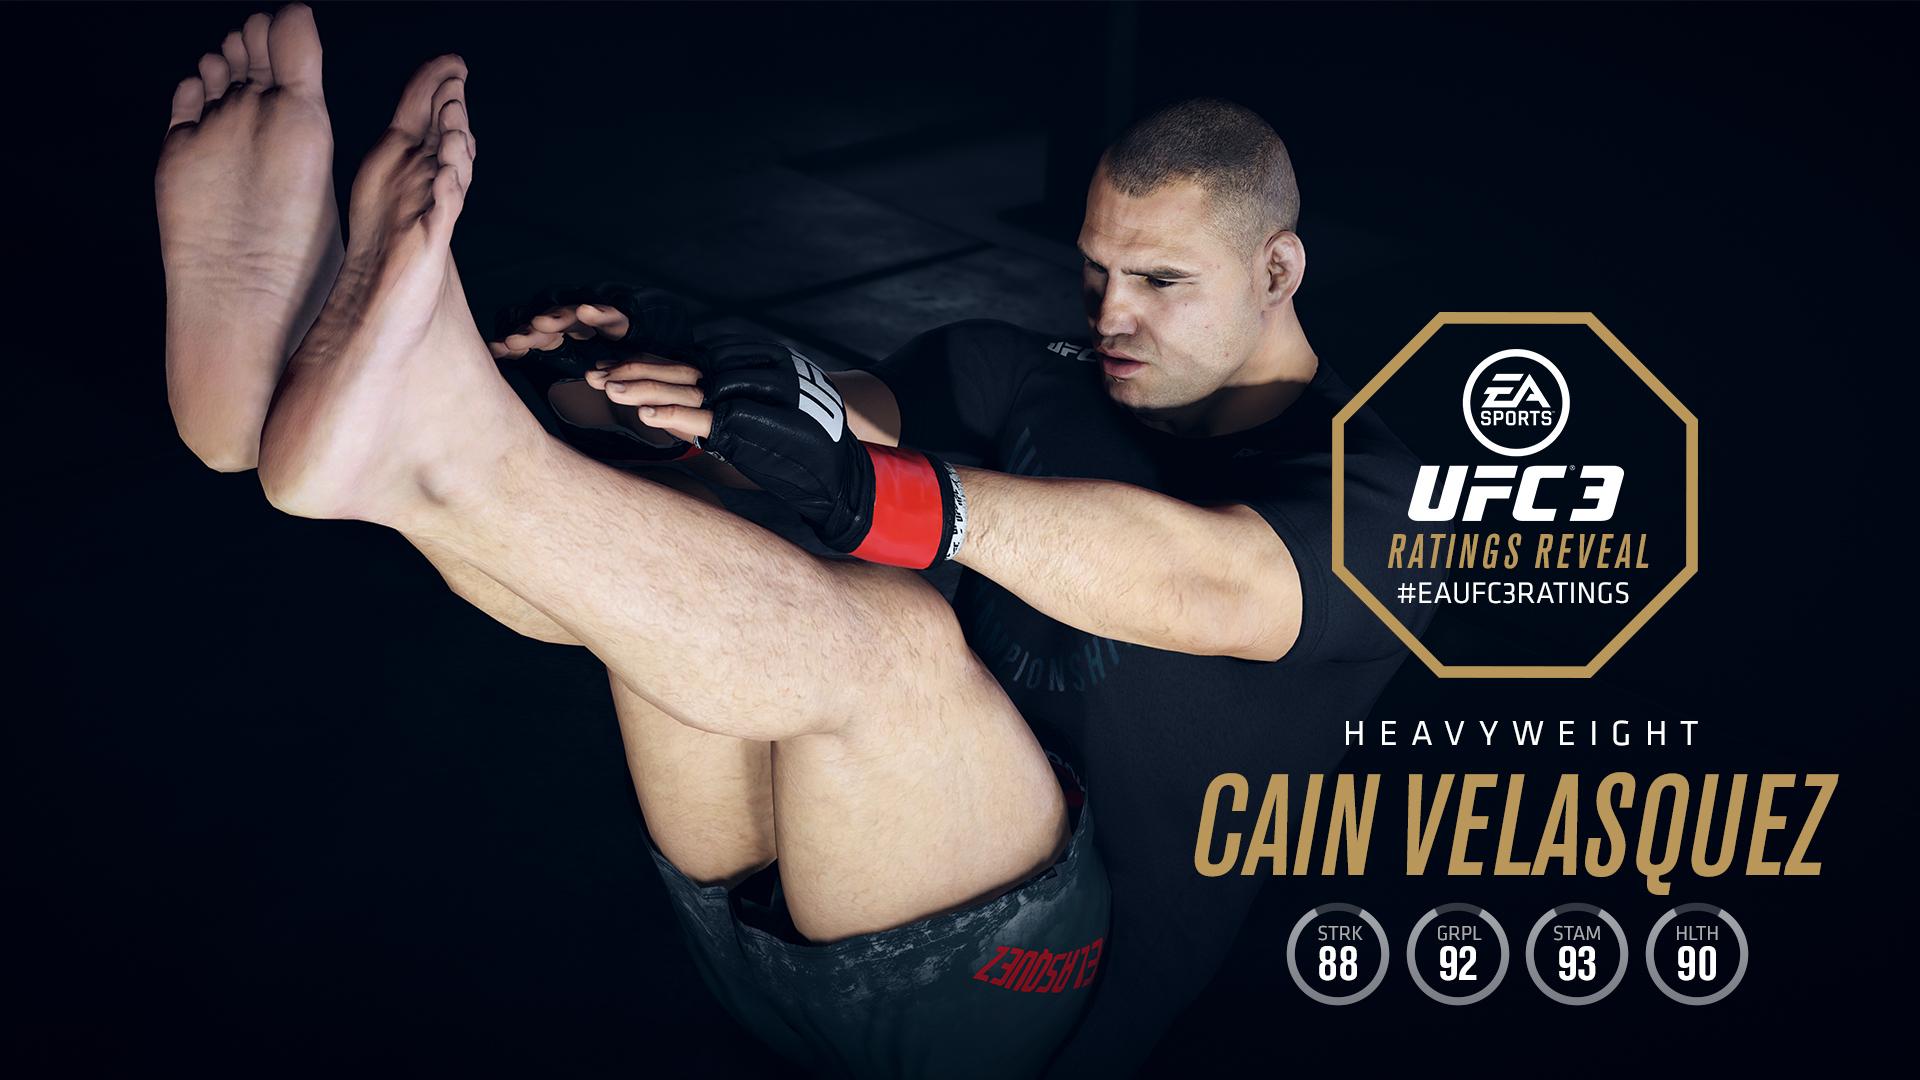 CainVelasquez_Heavyweight_1920x1080